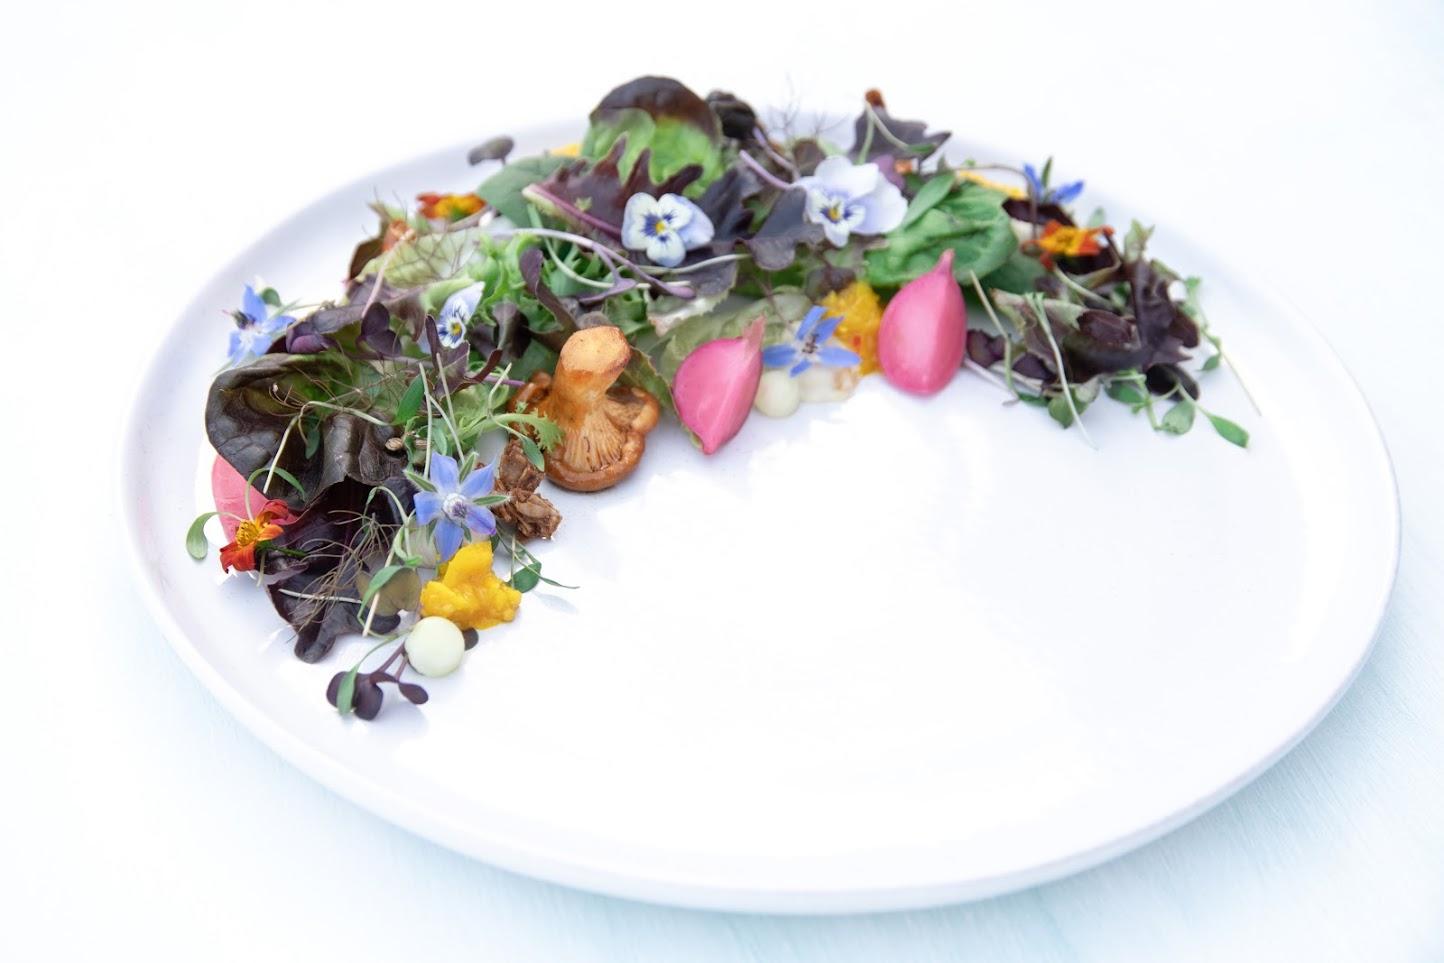 Deliciously Raw Salad Plating